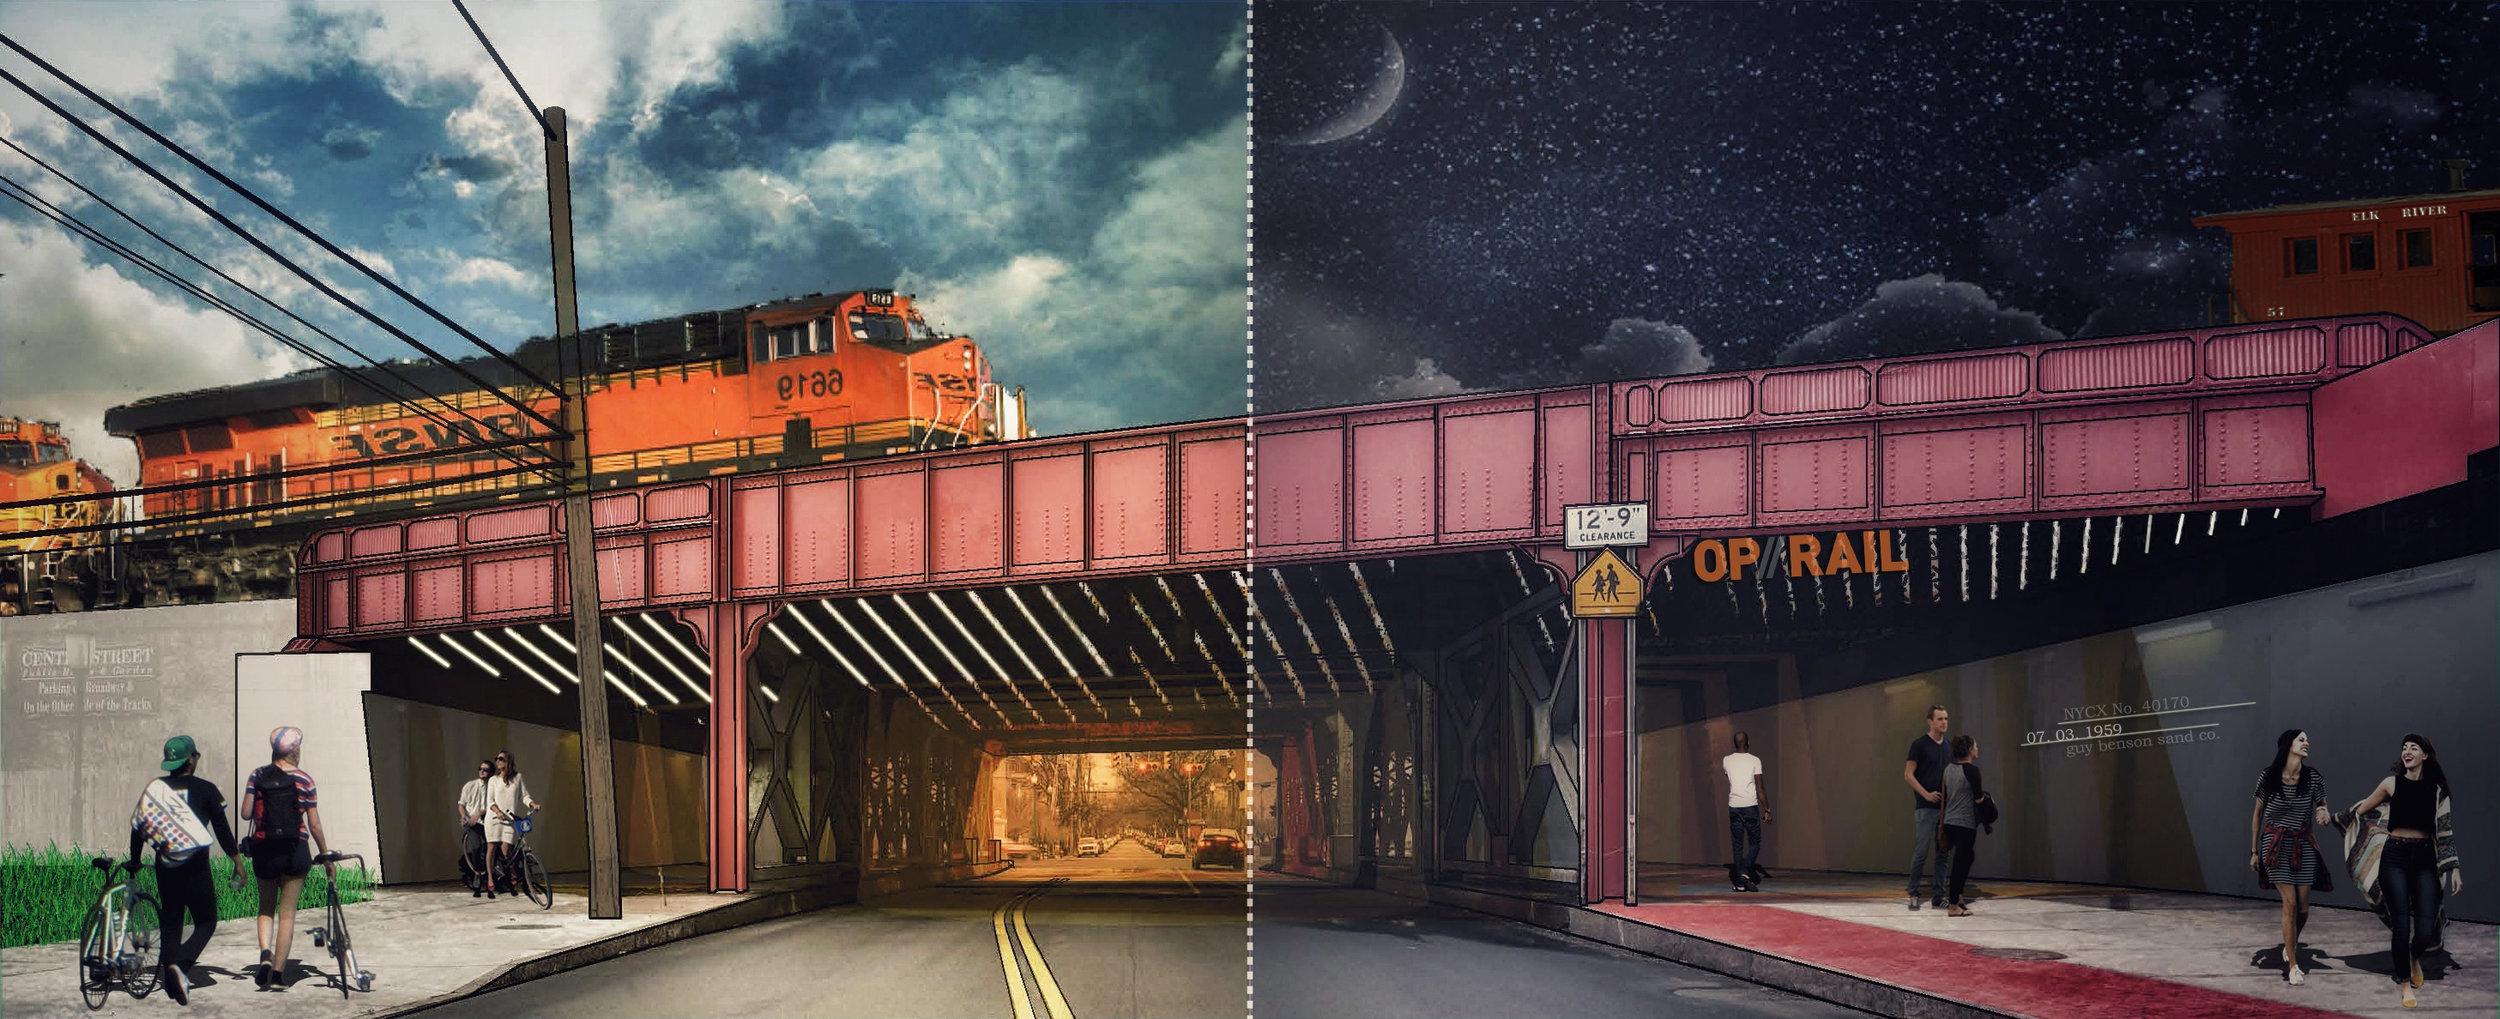 Pilot Design Installation Concept | b6 Union Street Underpass | Image by Paula Rand